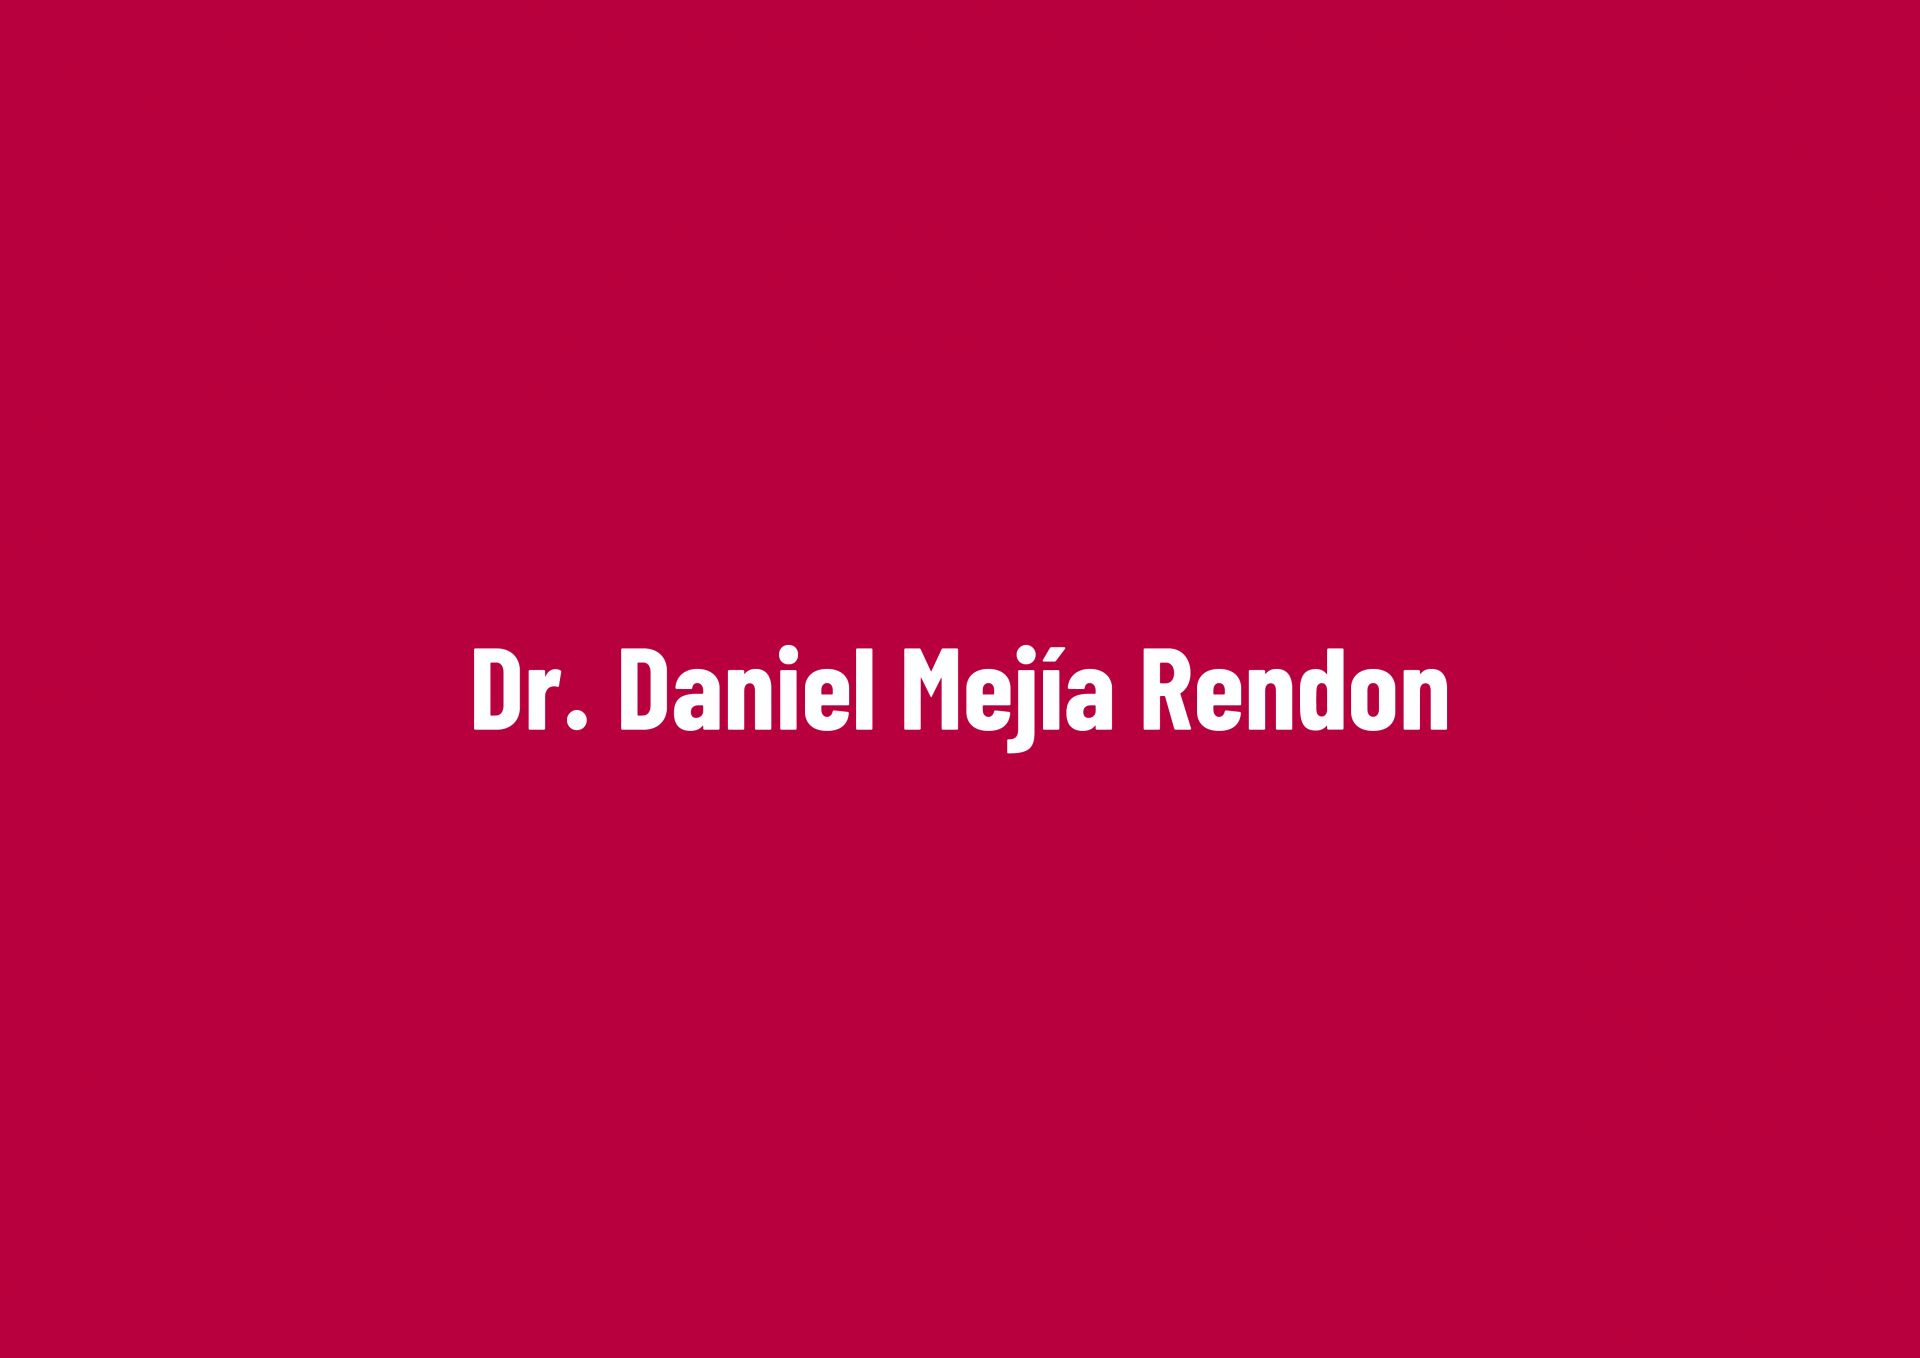 Dr. Daniel Mejía Rendon